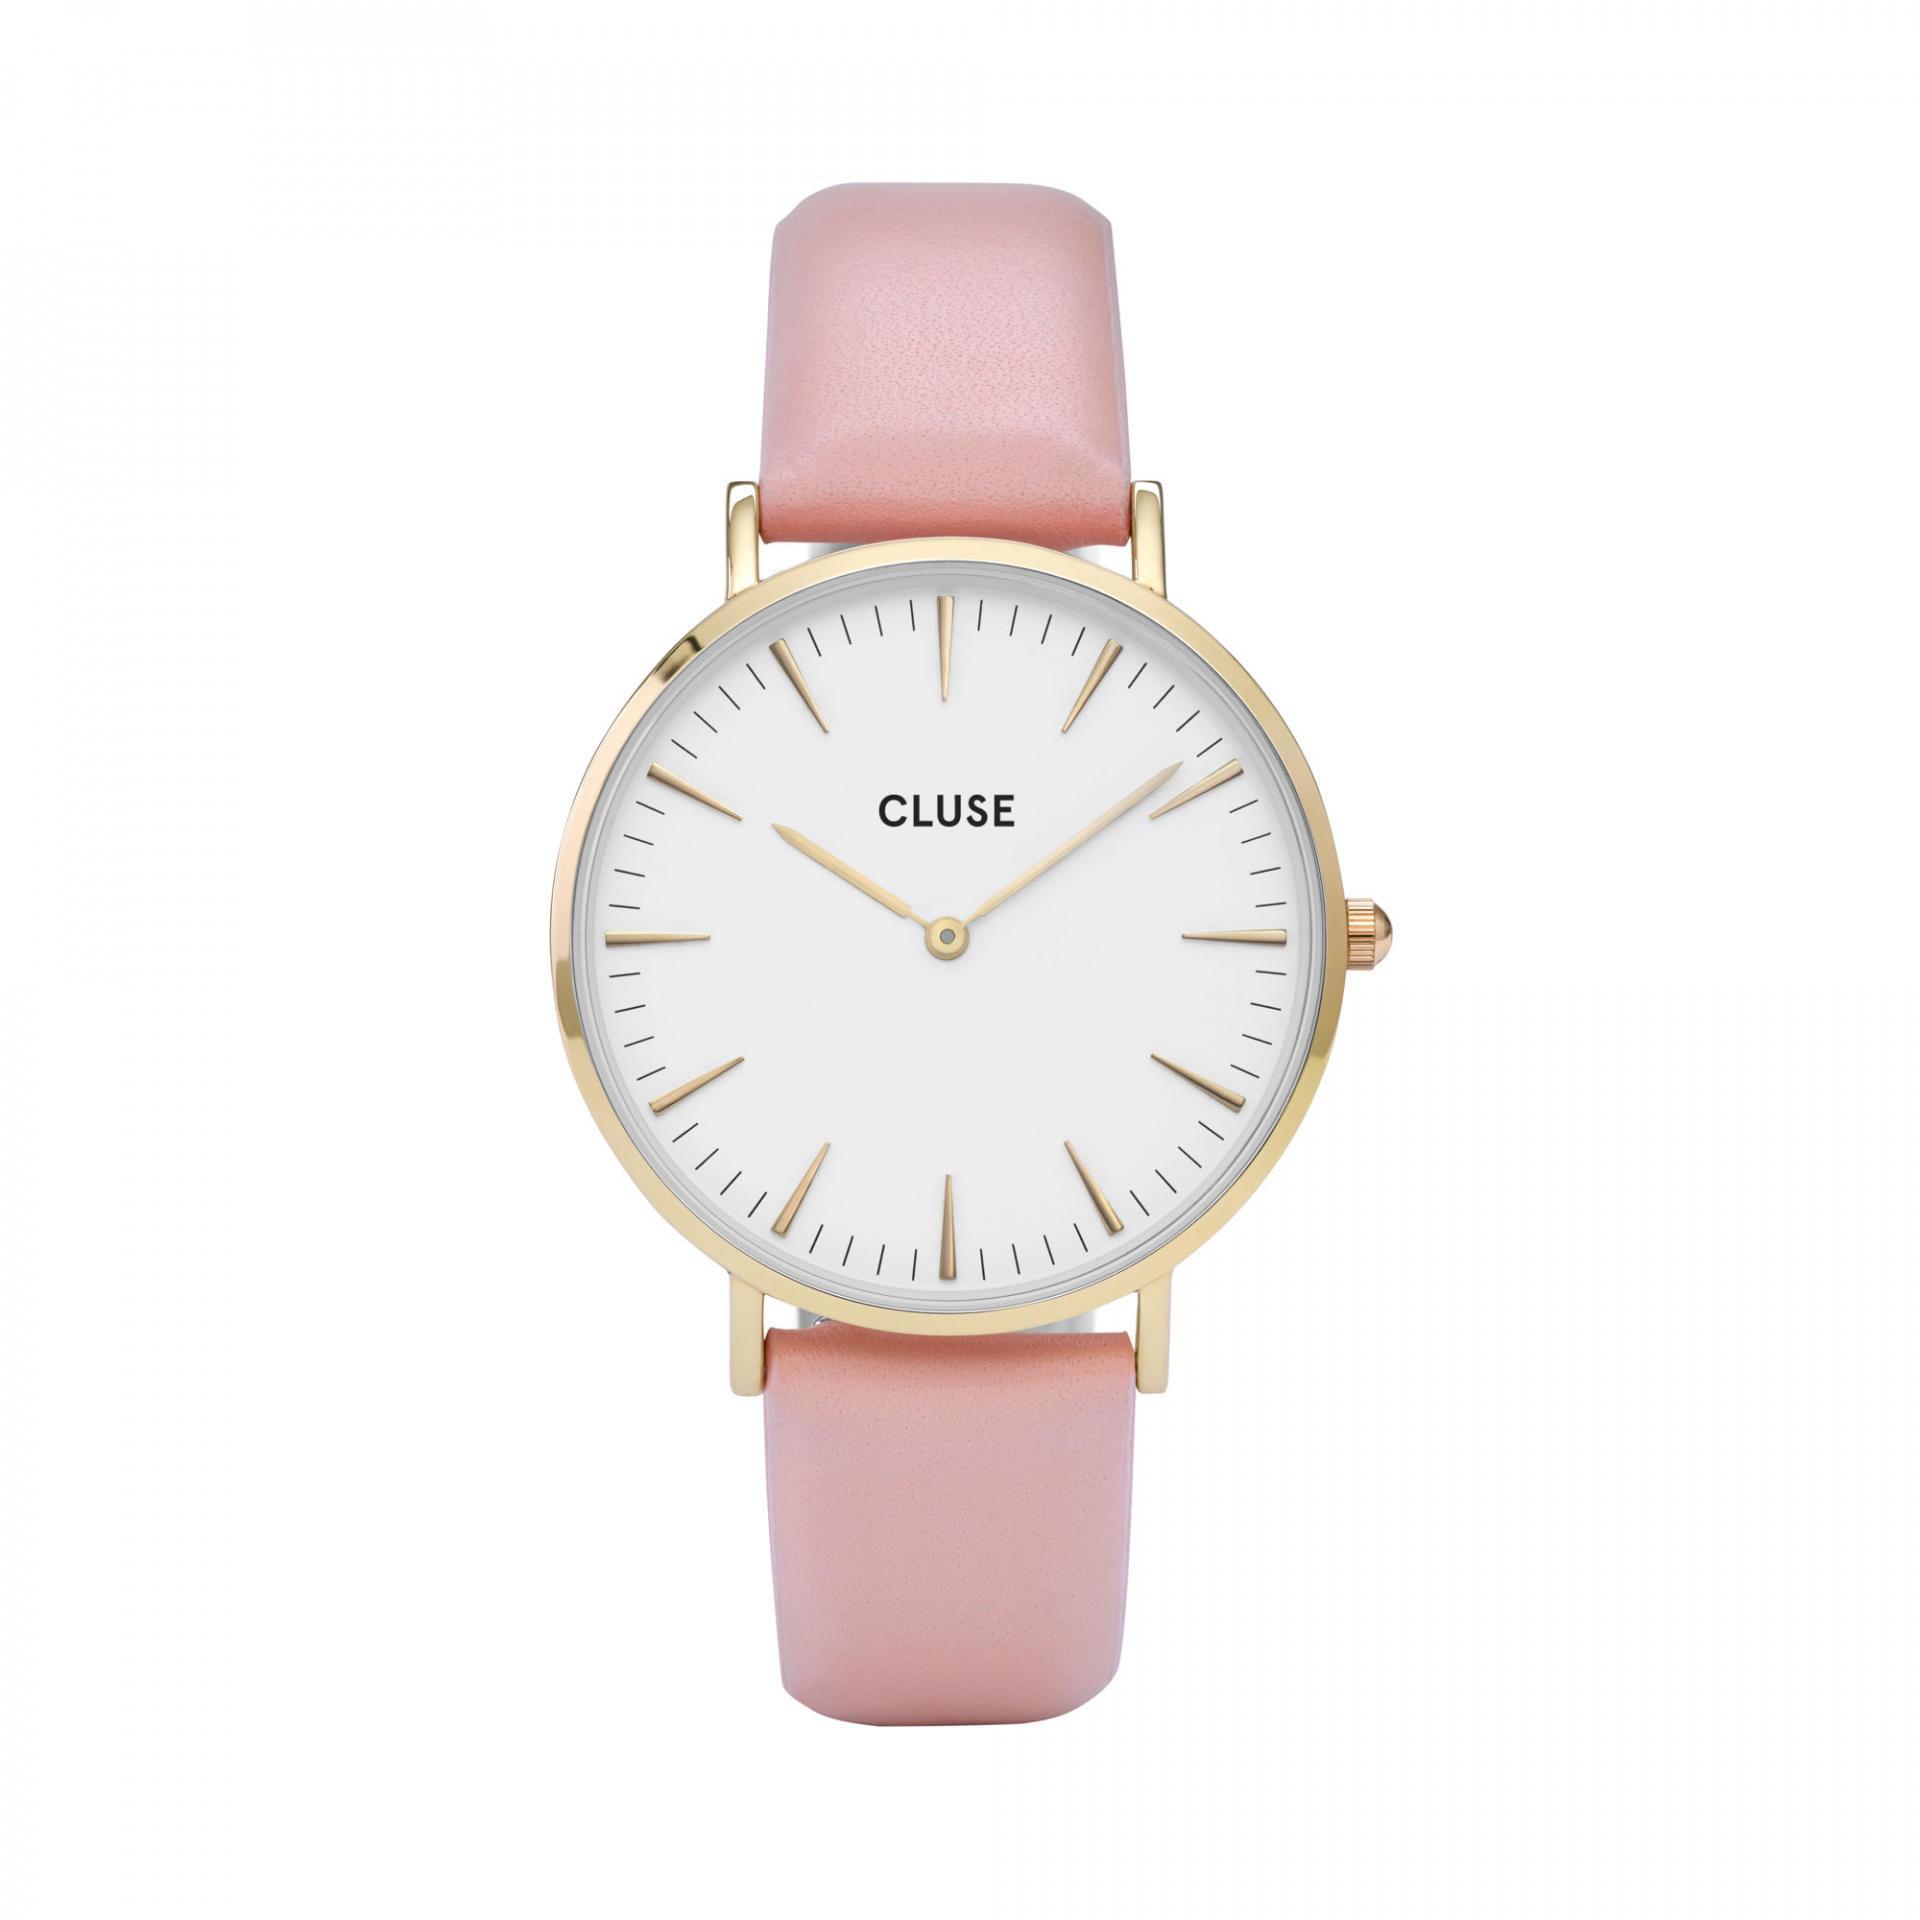 CLUSE Hodinky Cluse La Bohéme Gold white/pink, růžová barva, bílá barva, sklo, kov, kůže